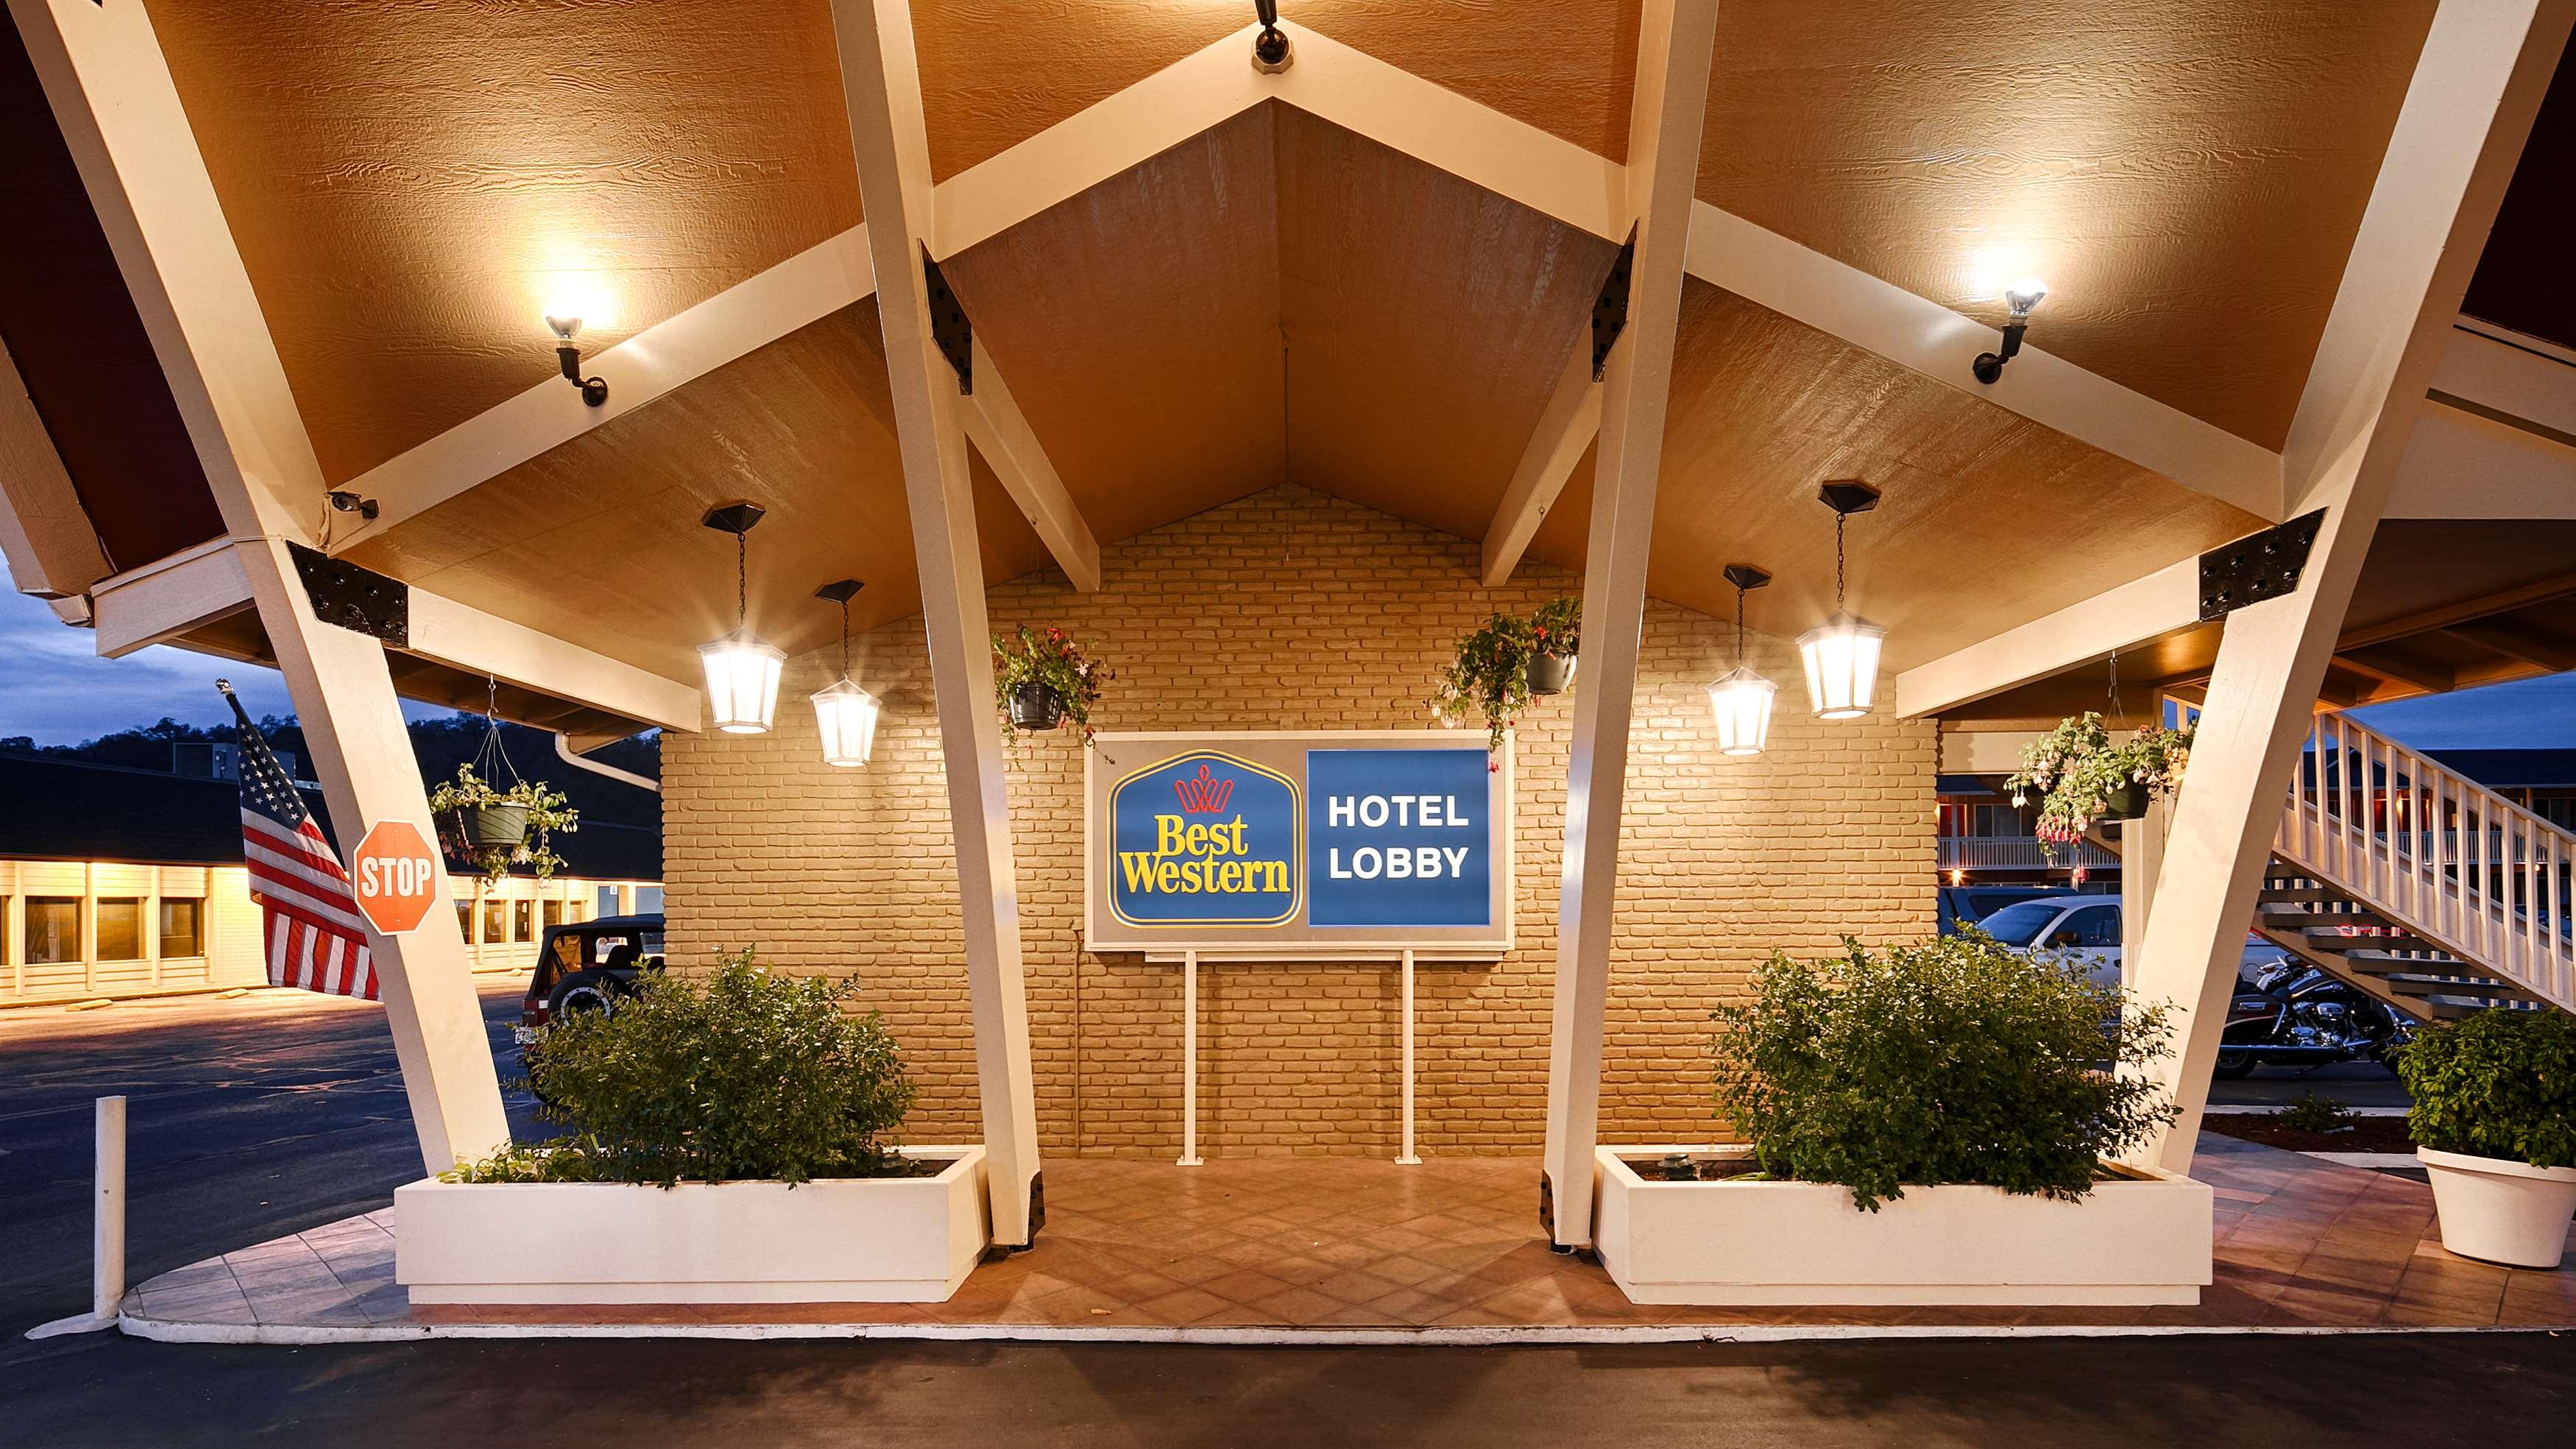 Best Western Garden Villa Inn In Roseburg Or 541 672 1